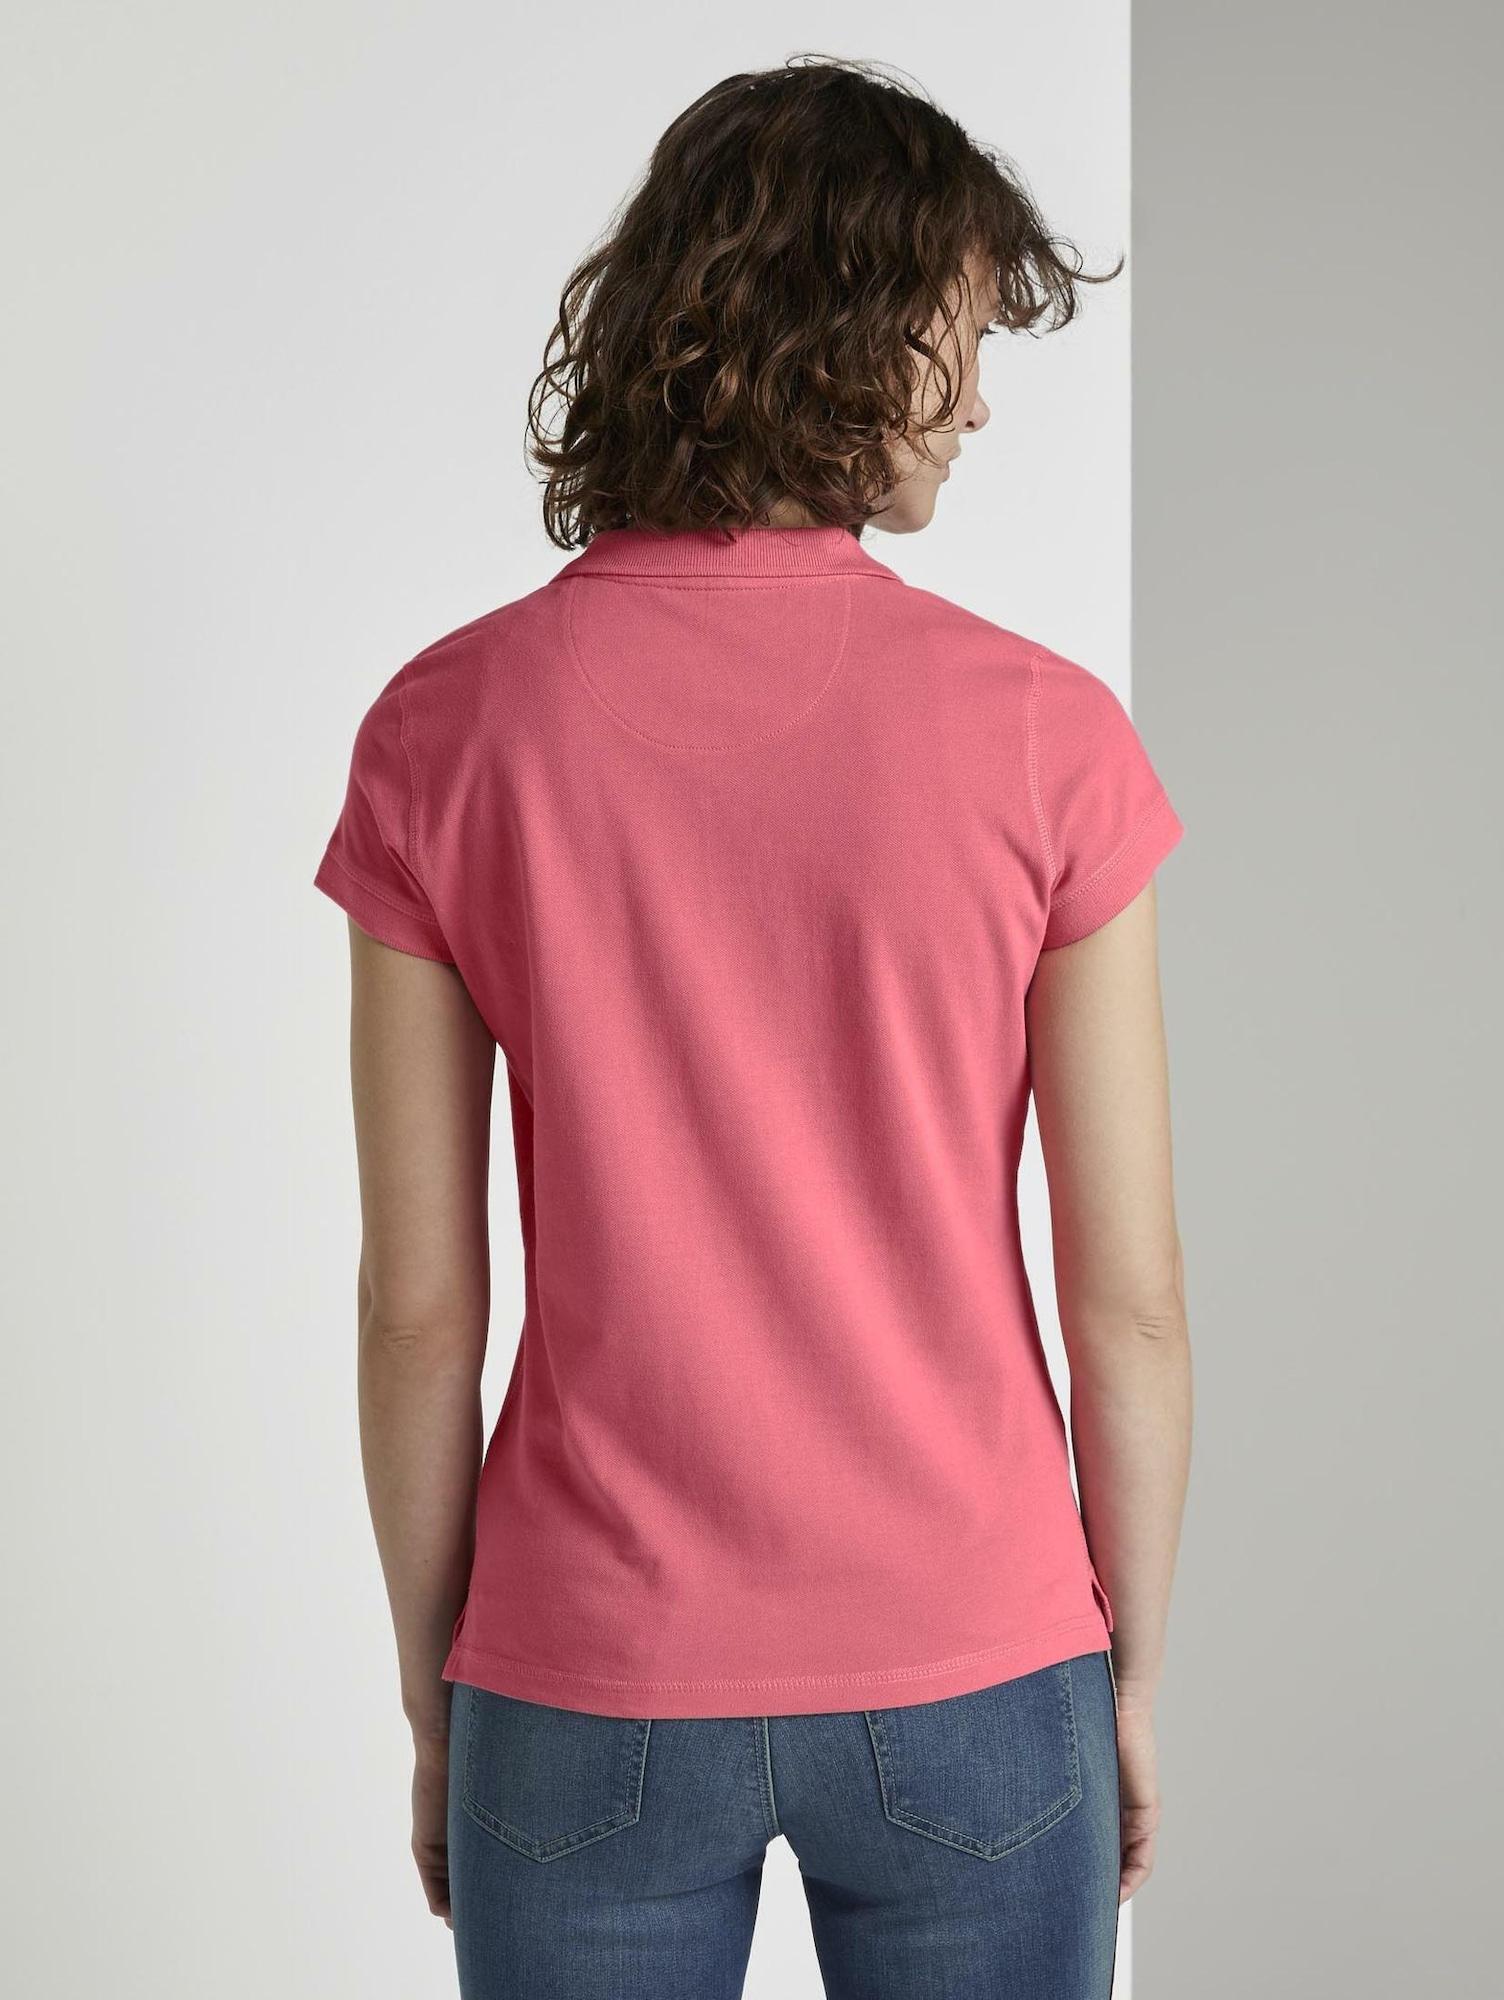 tom tailor - Shirt